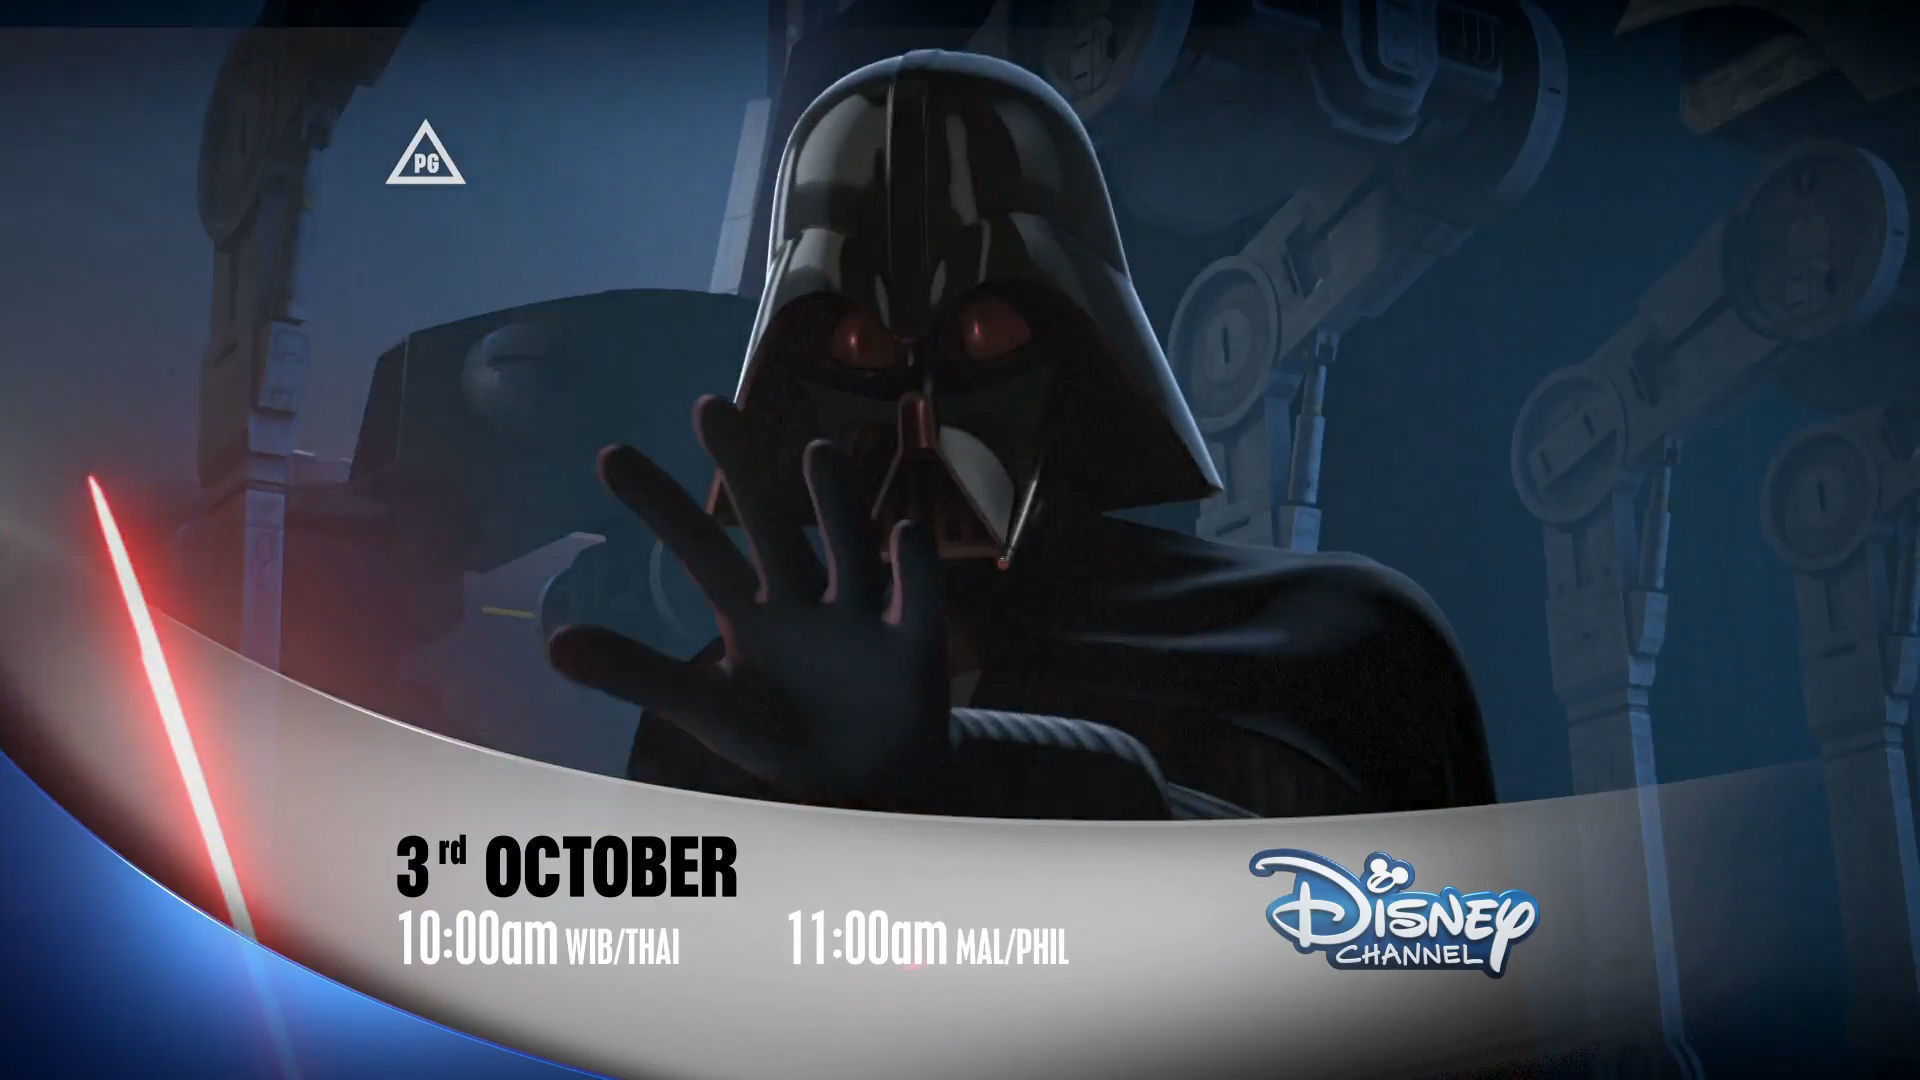 Star Wars Rebels: The Siege Of Lothal On Disney Channel Trailer 3